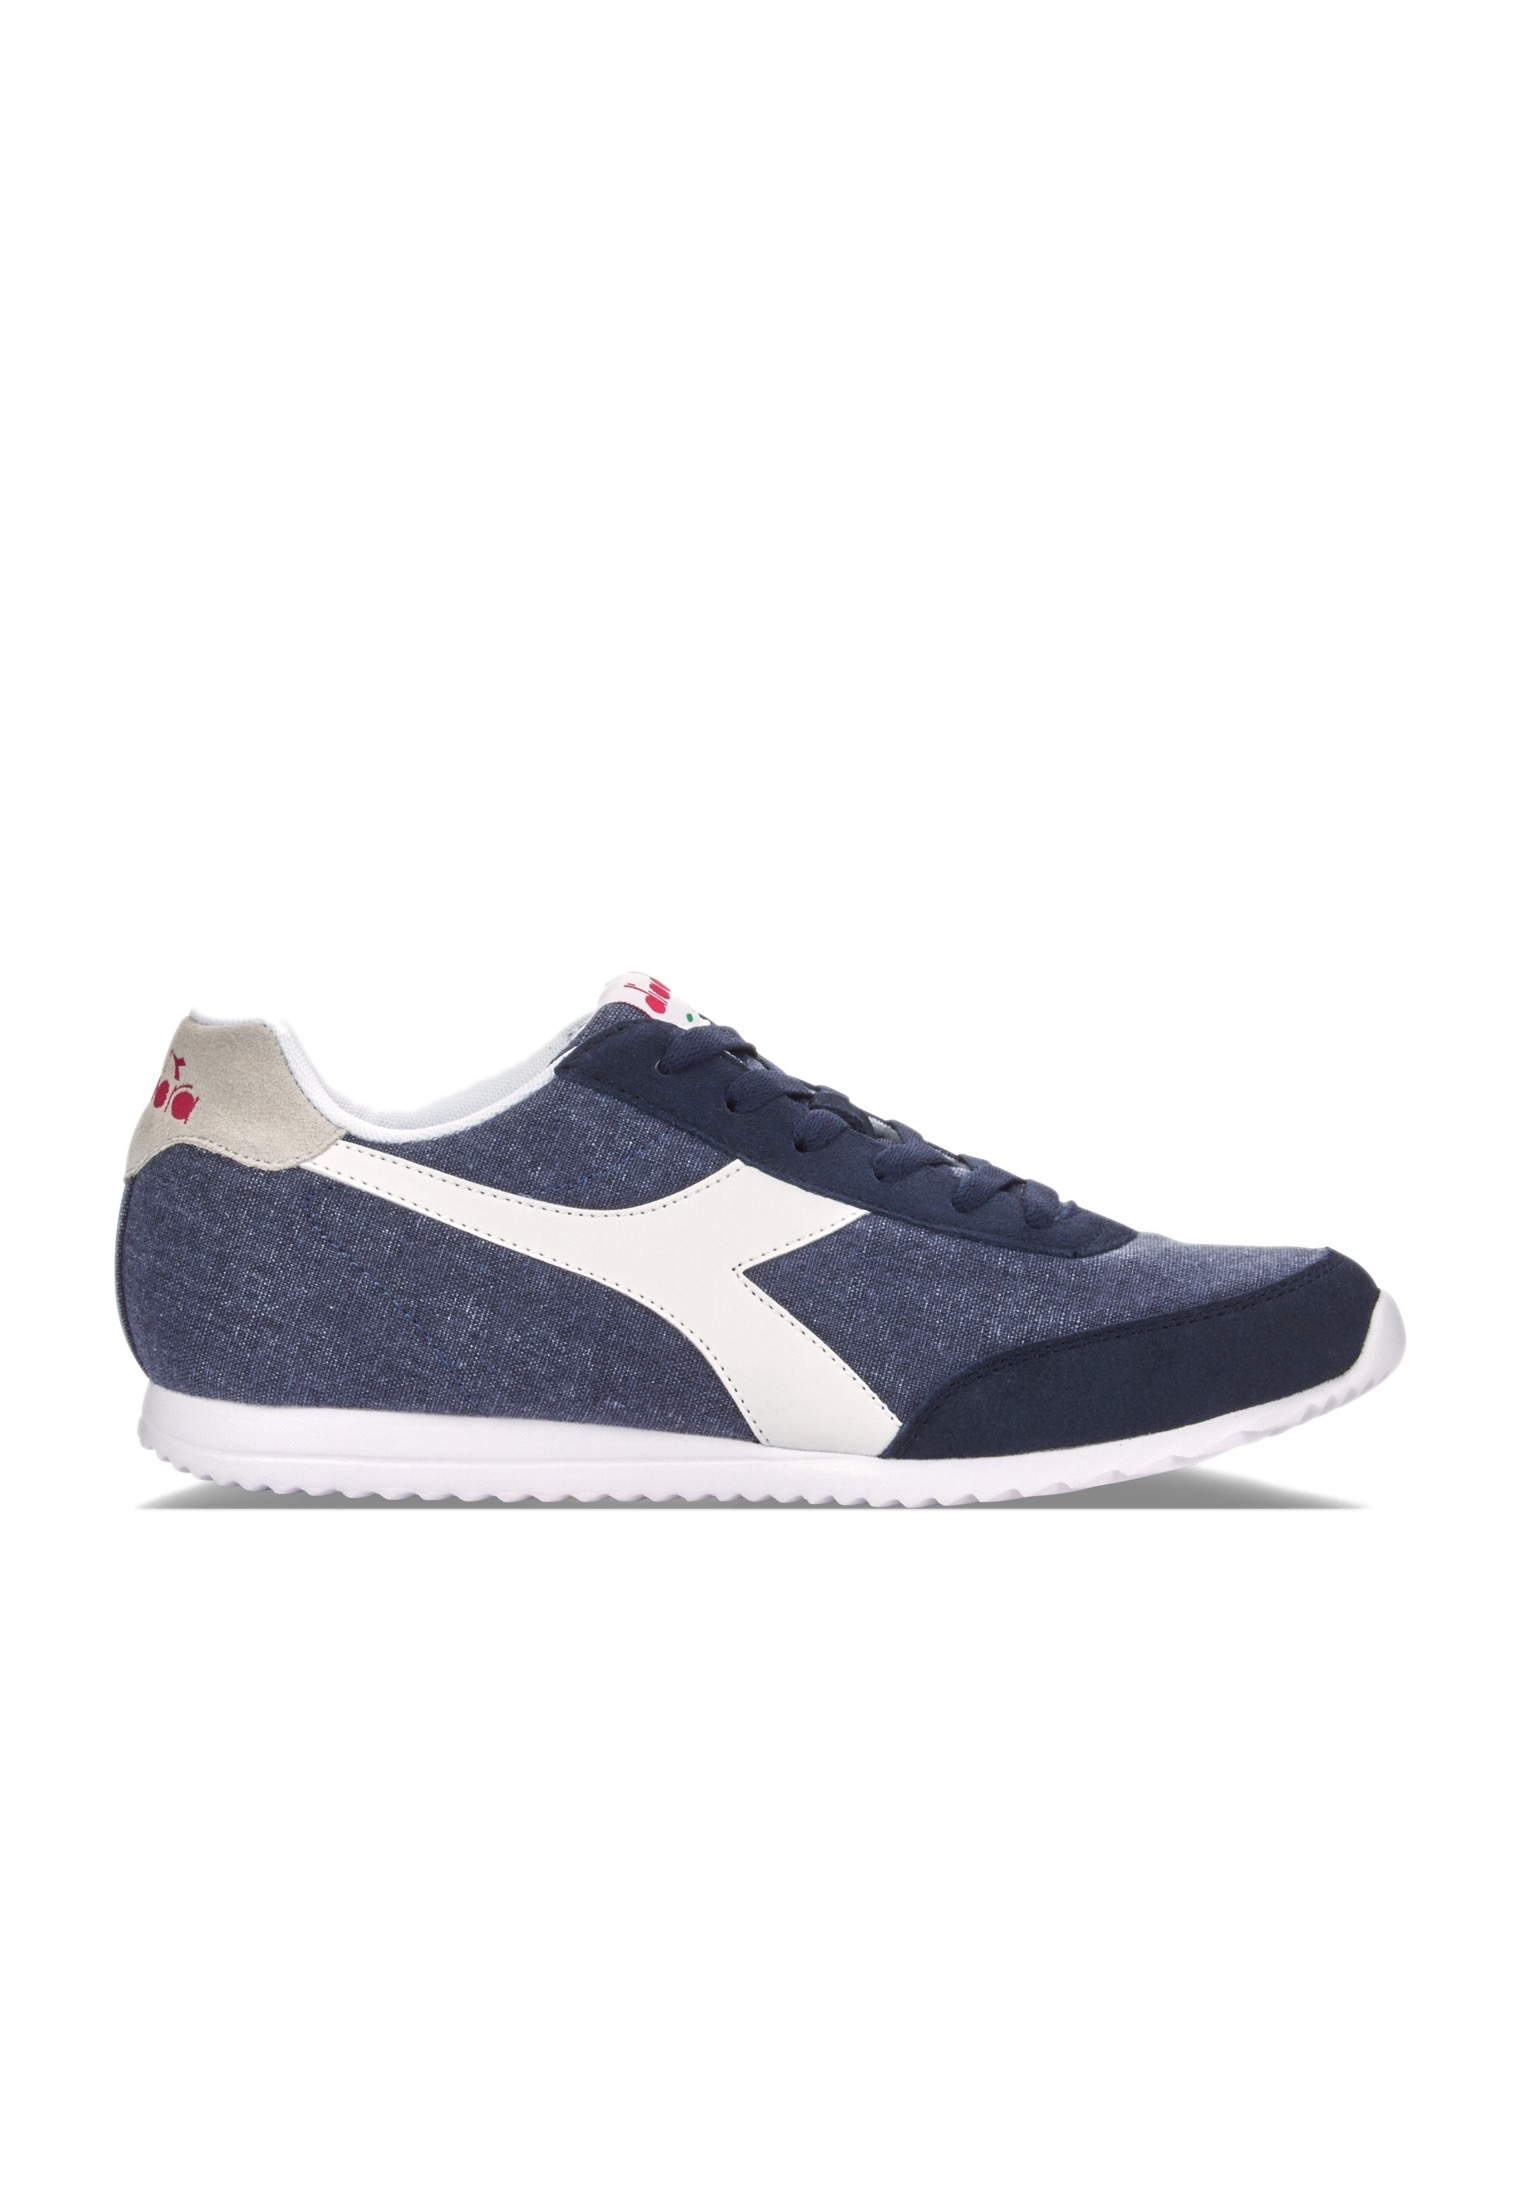 Scarpe-Diadora-Jog-Light-C-Sneakers-sportive-uomo-donna-vari-colori-e-taglie miniatura 25